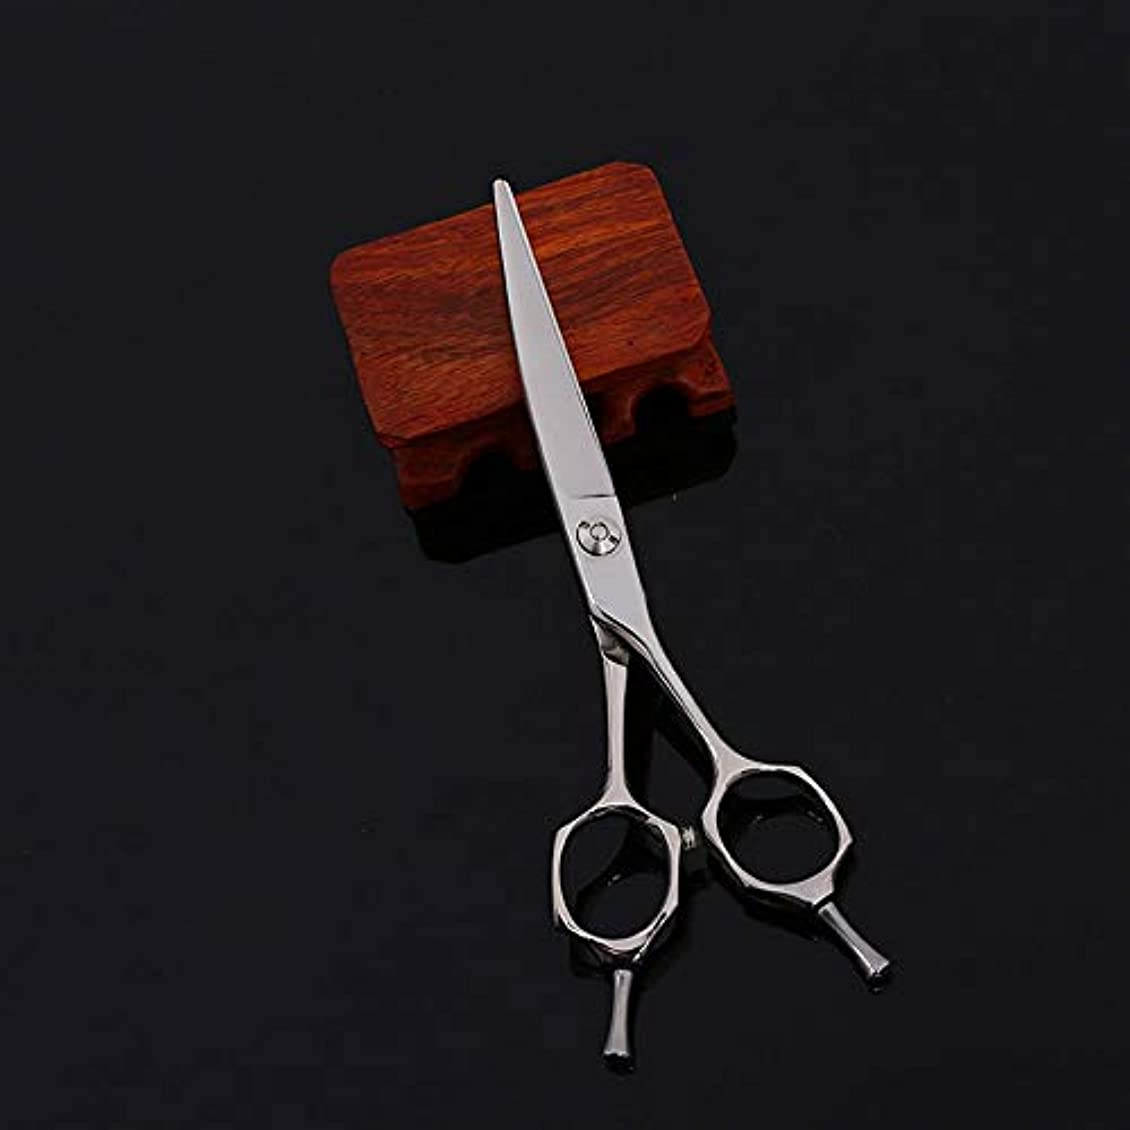 Goodsok-jp 6インチの専門の上限の理髪はさみ用具のせん断 (色 : Silver)